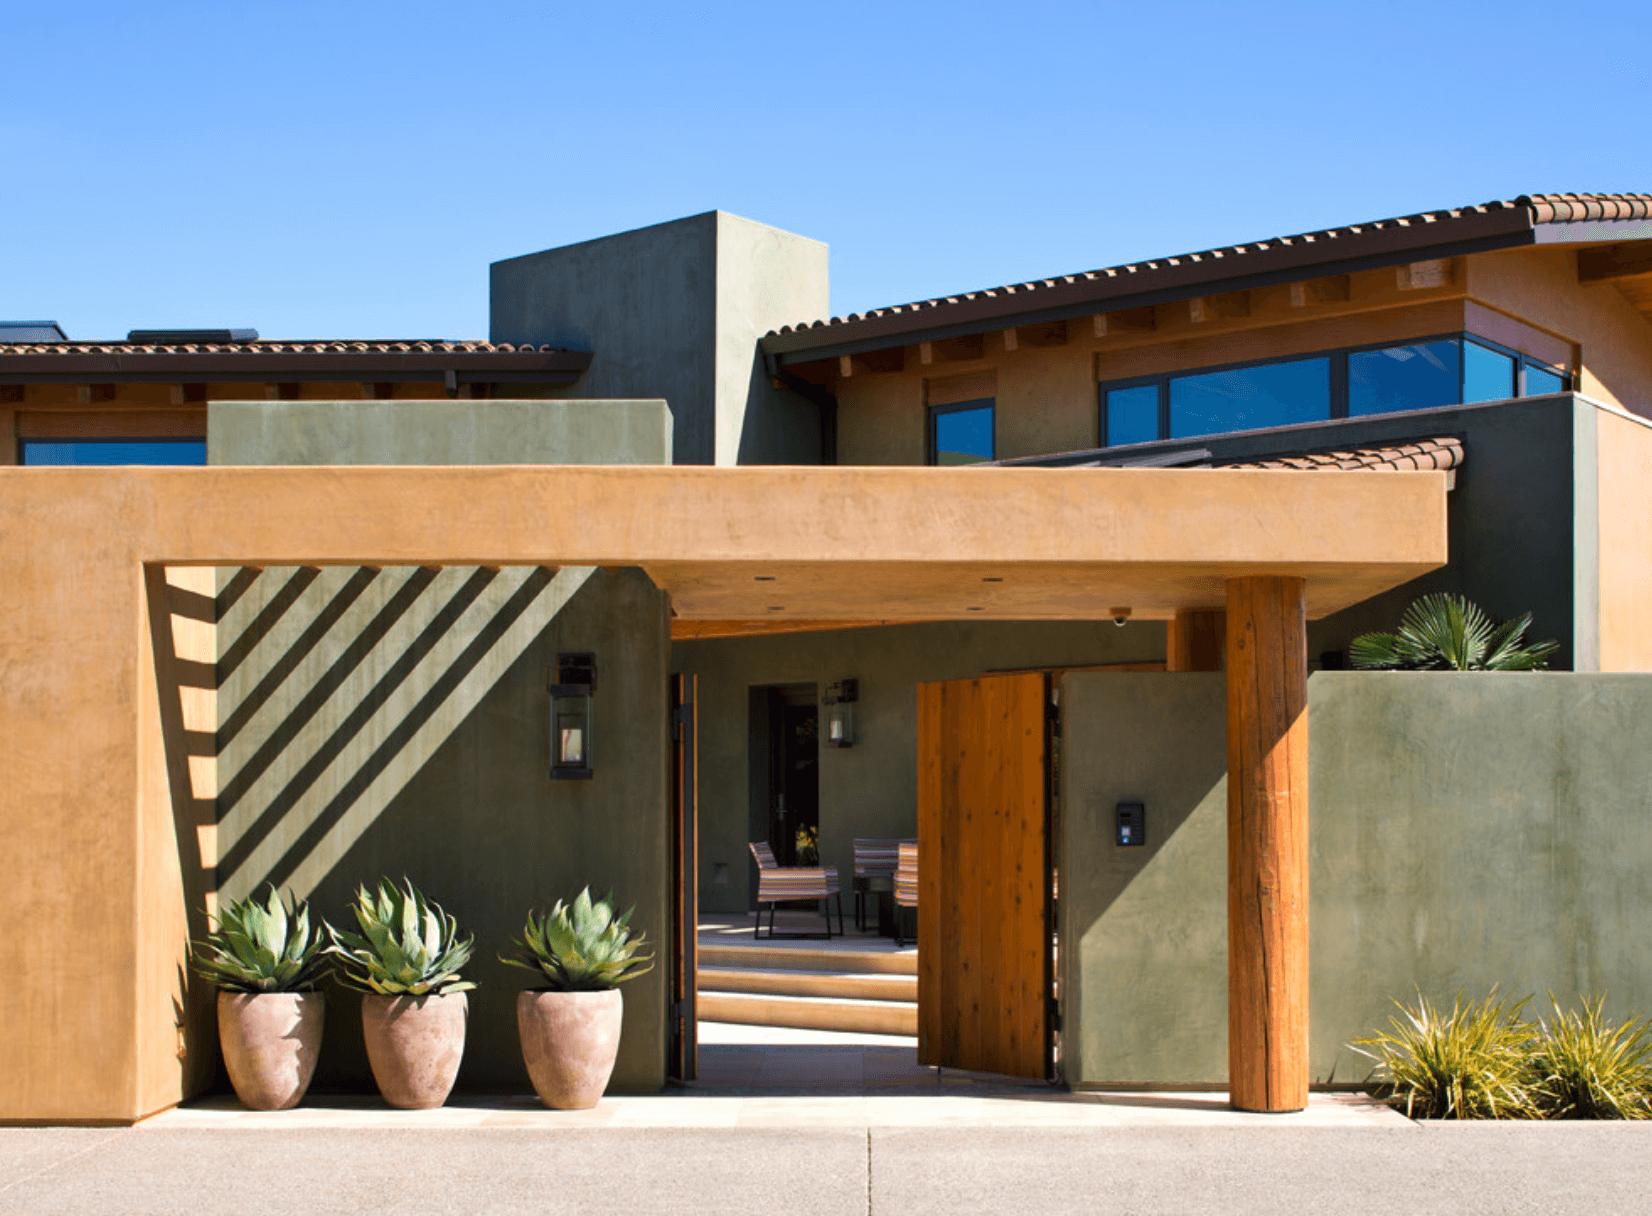 Casa de campo como projetar arquidicas - Fachadas de casas ...